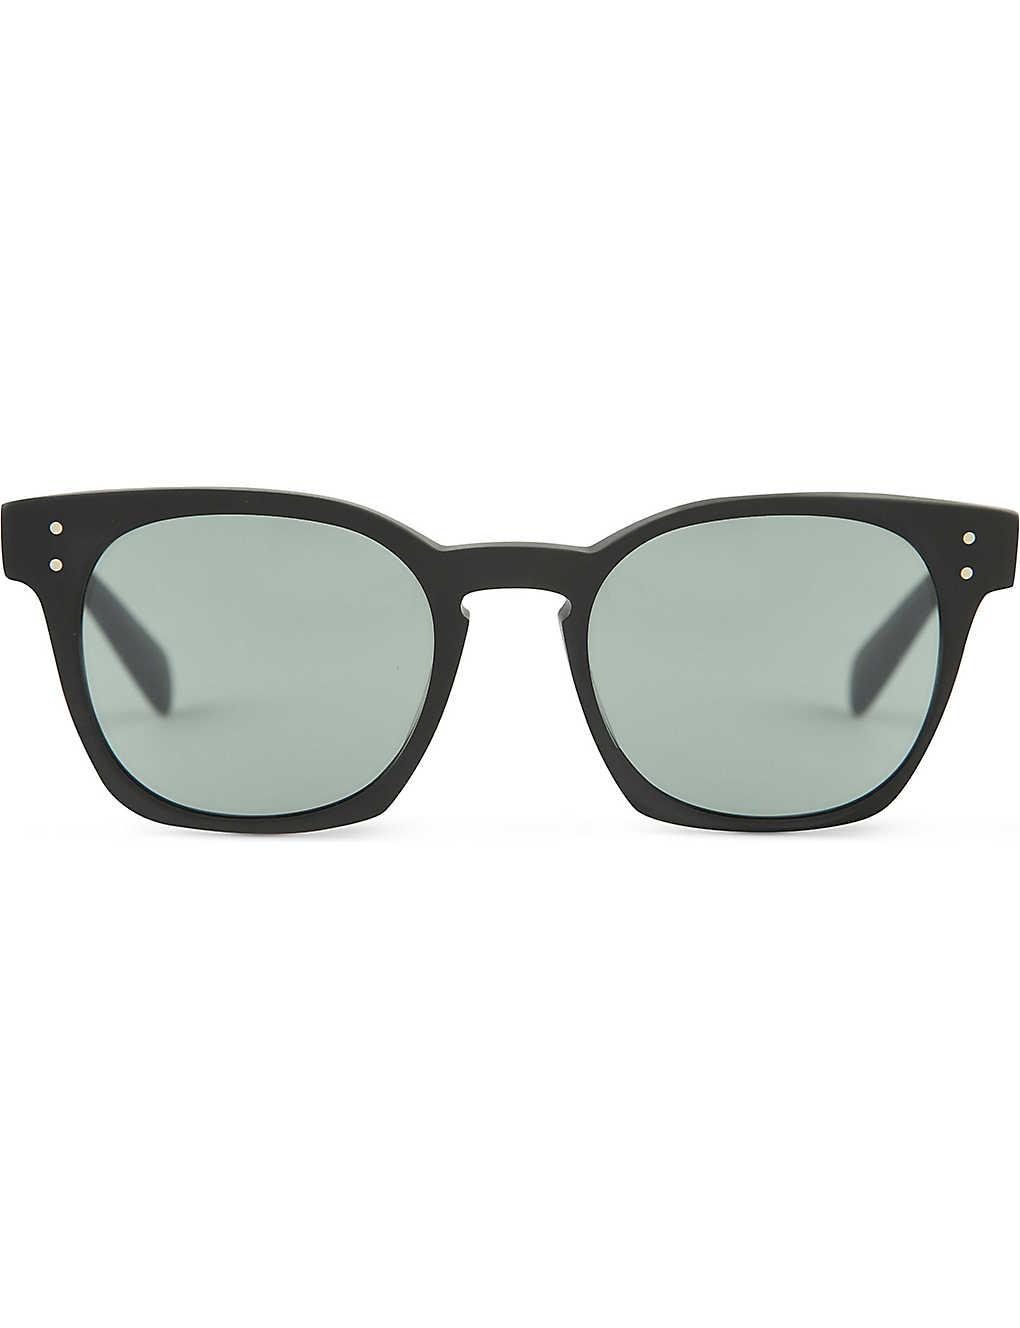 54bdc36cfa35 BYREDO Oliver Peoples photochromic sunglasses- L10016 Matte Black and Indigo